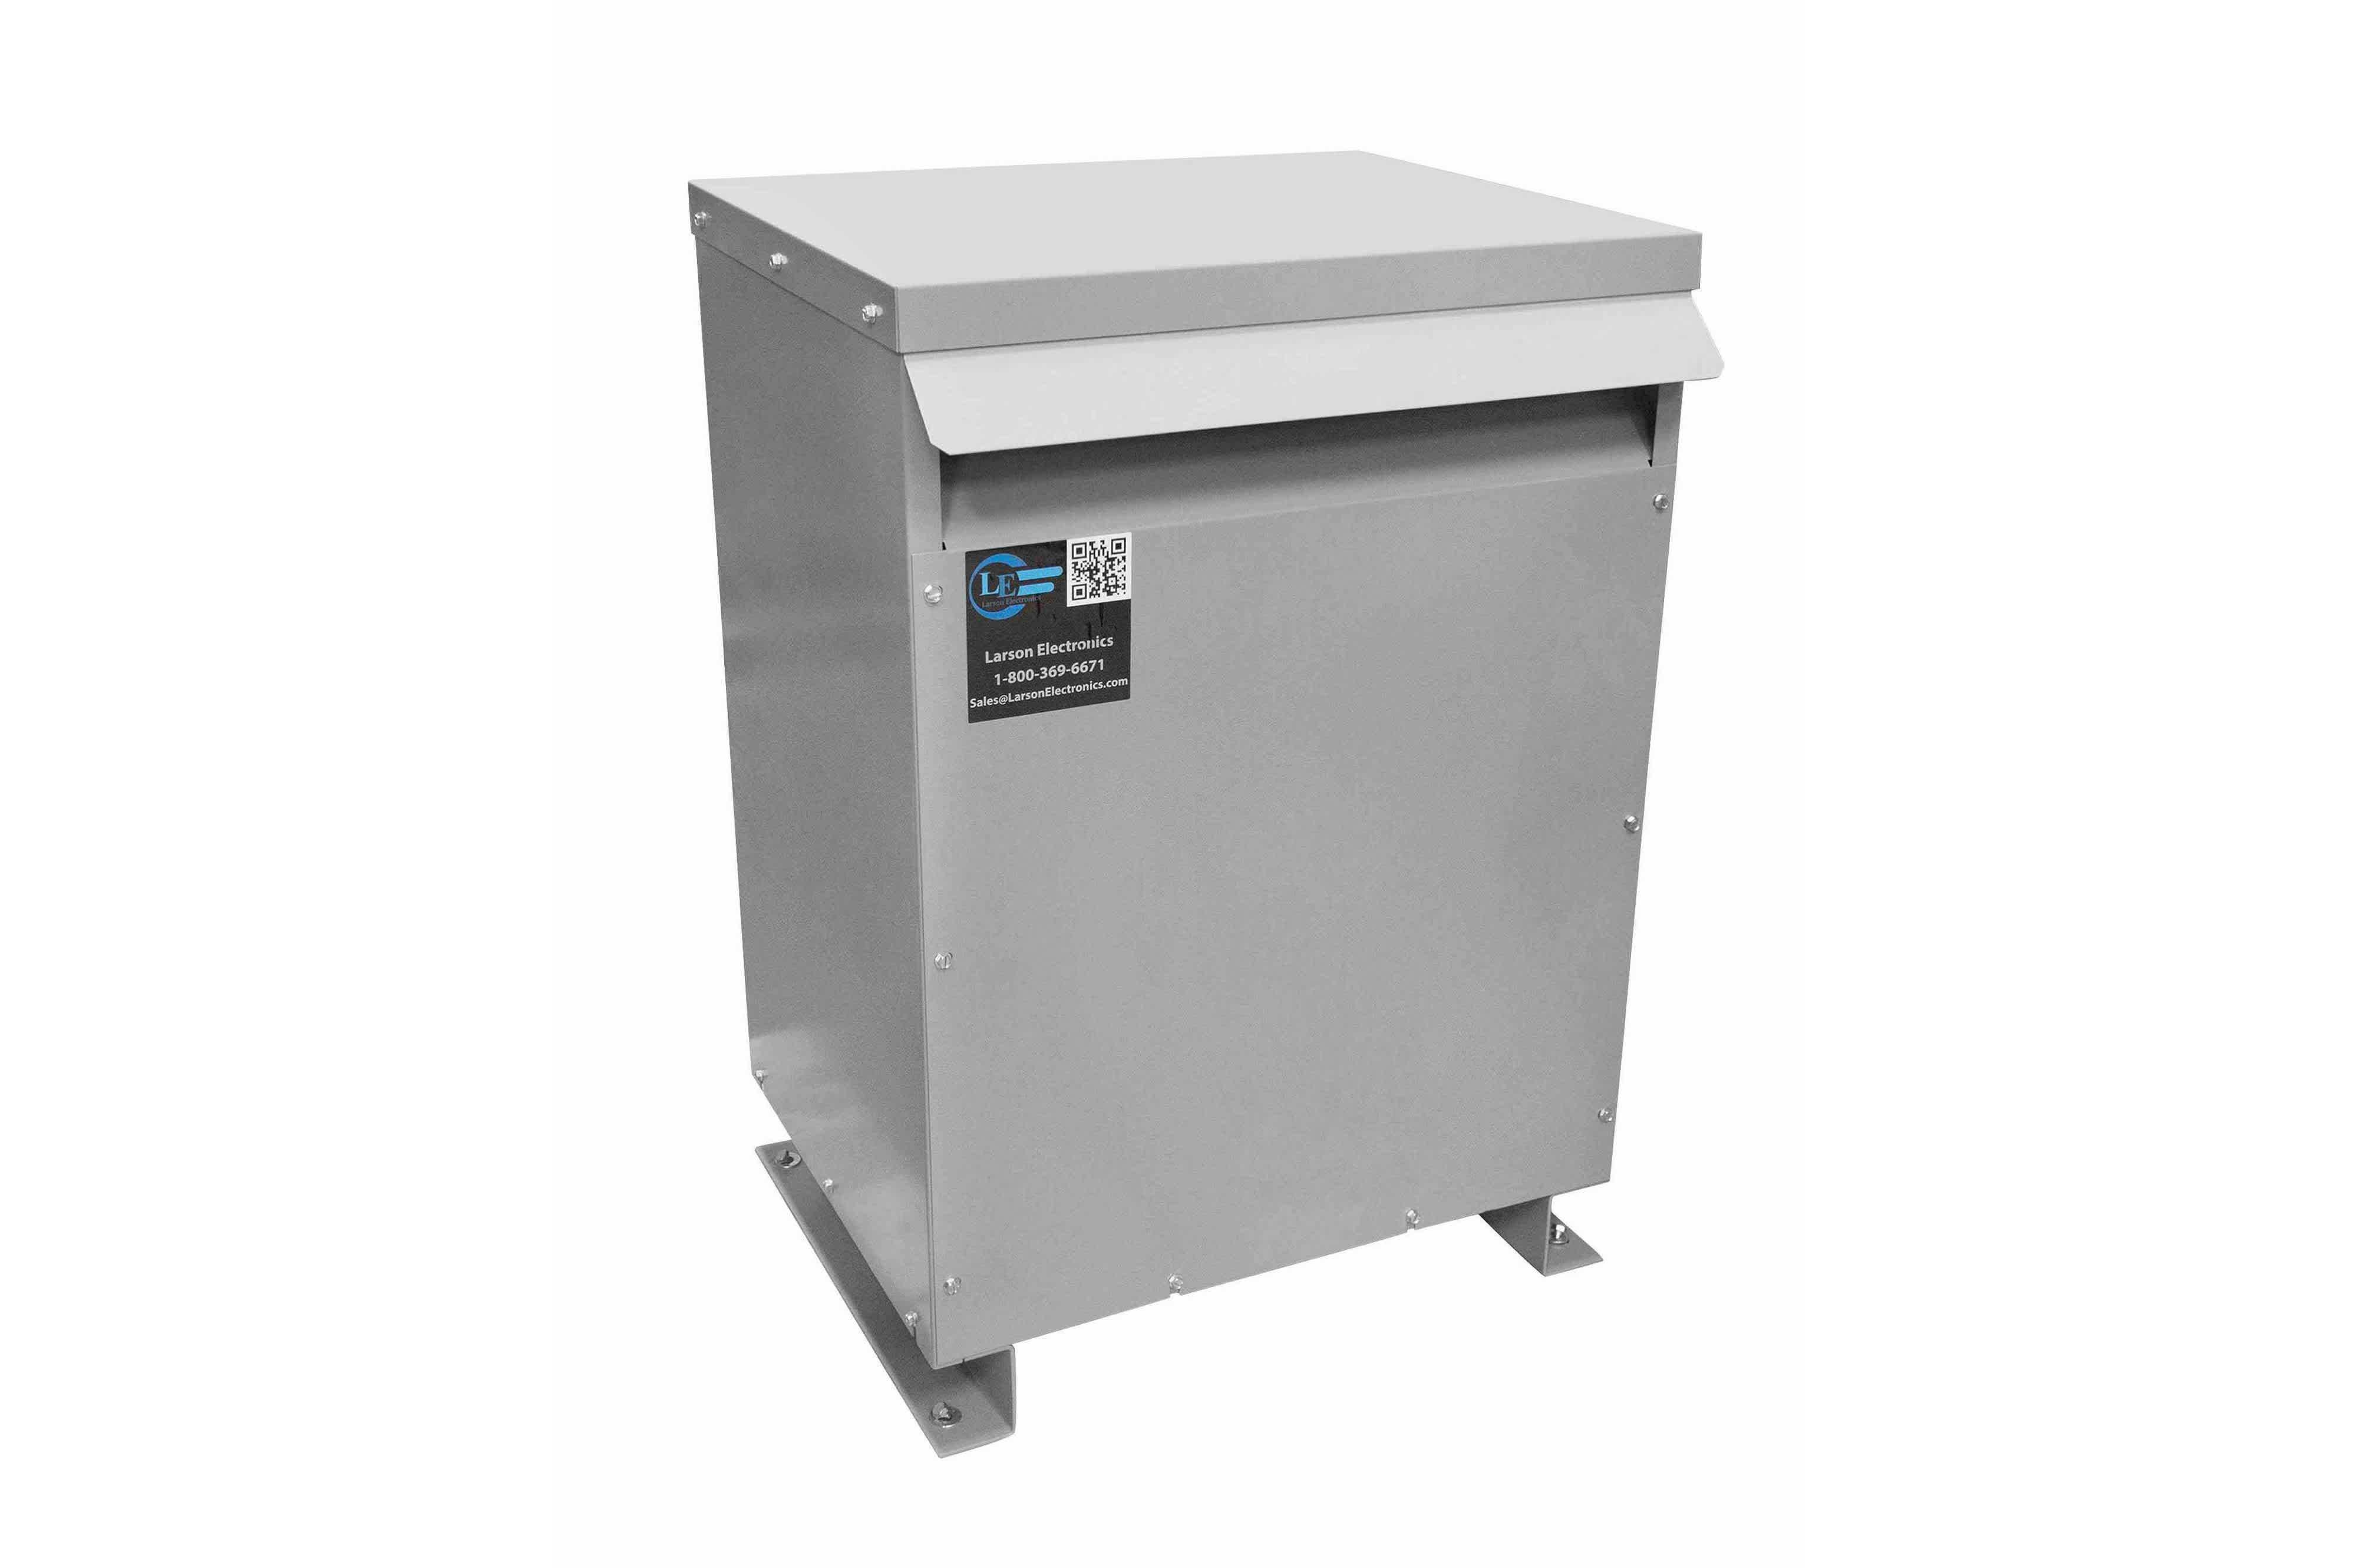 10 kVA 3PH Isolation Transformer, 220V Wye Primary, 480V Delta Secondary, N3R, Ventilated, 60 Hz